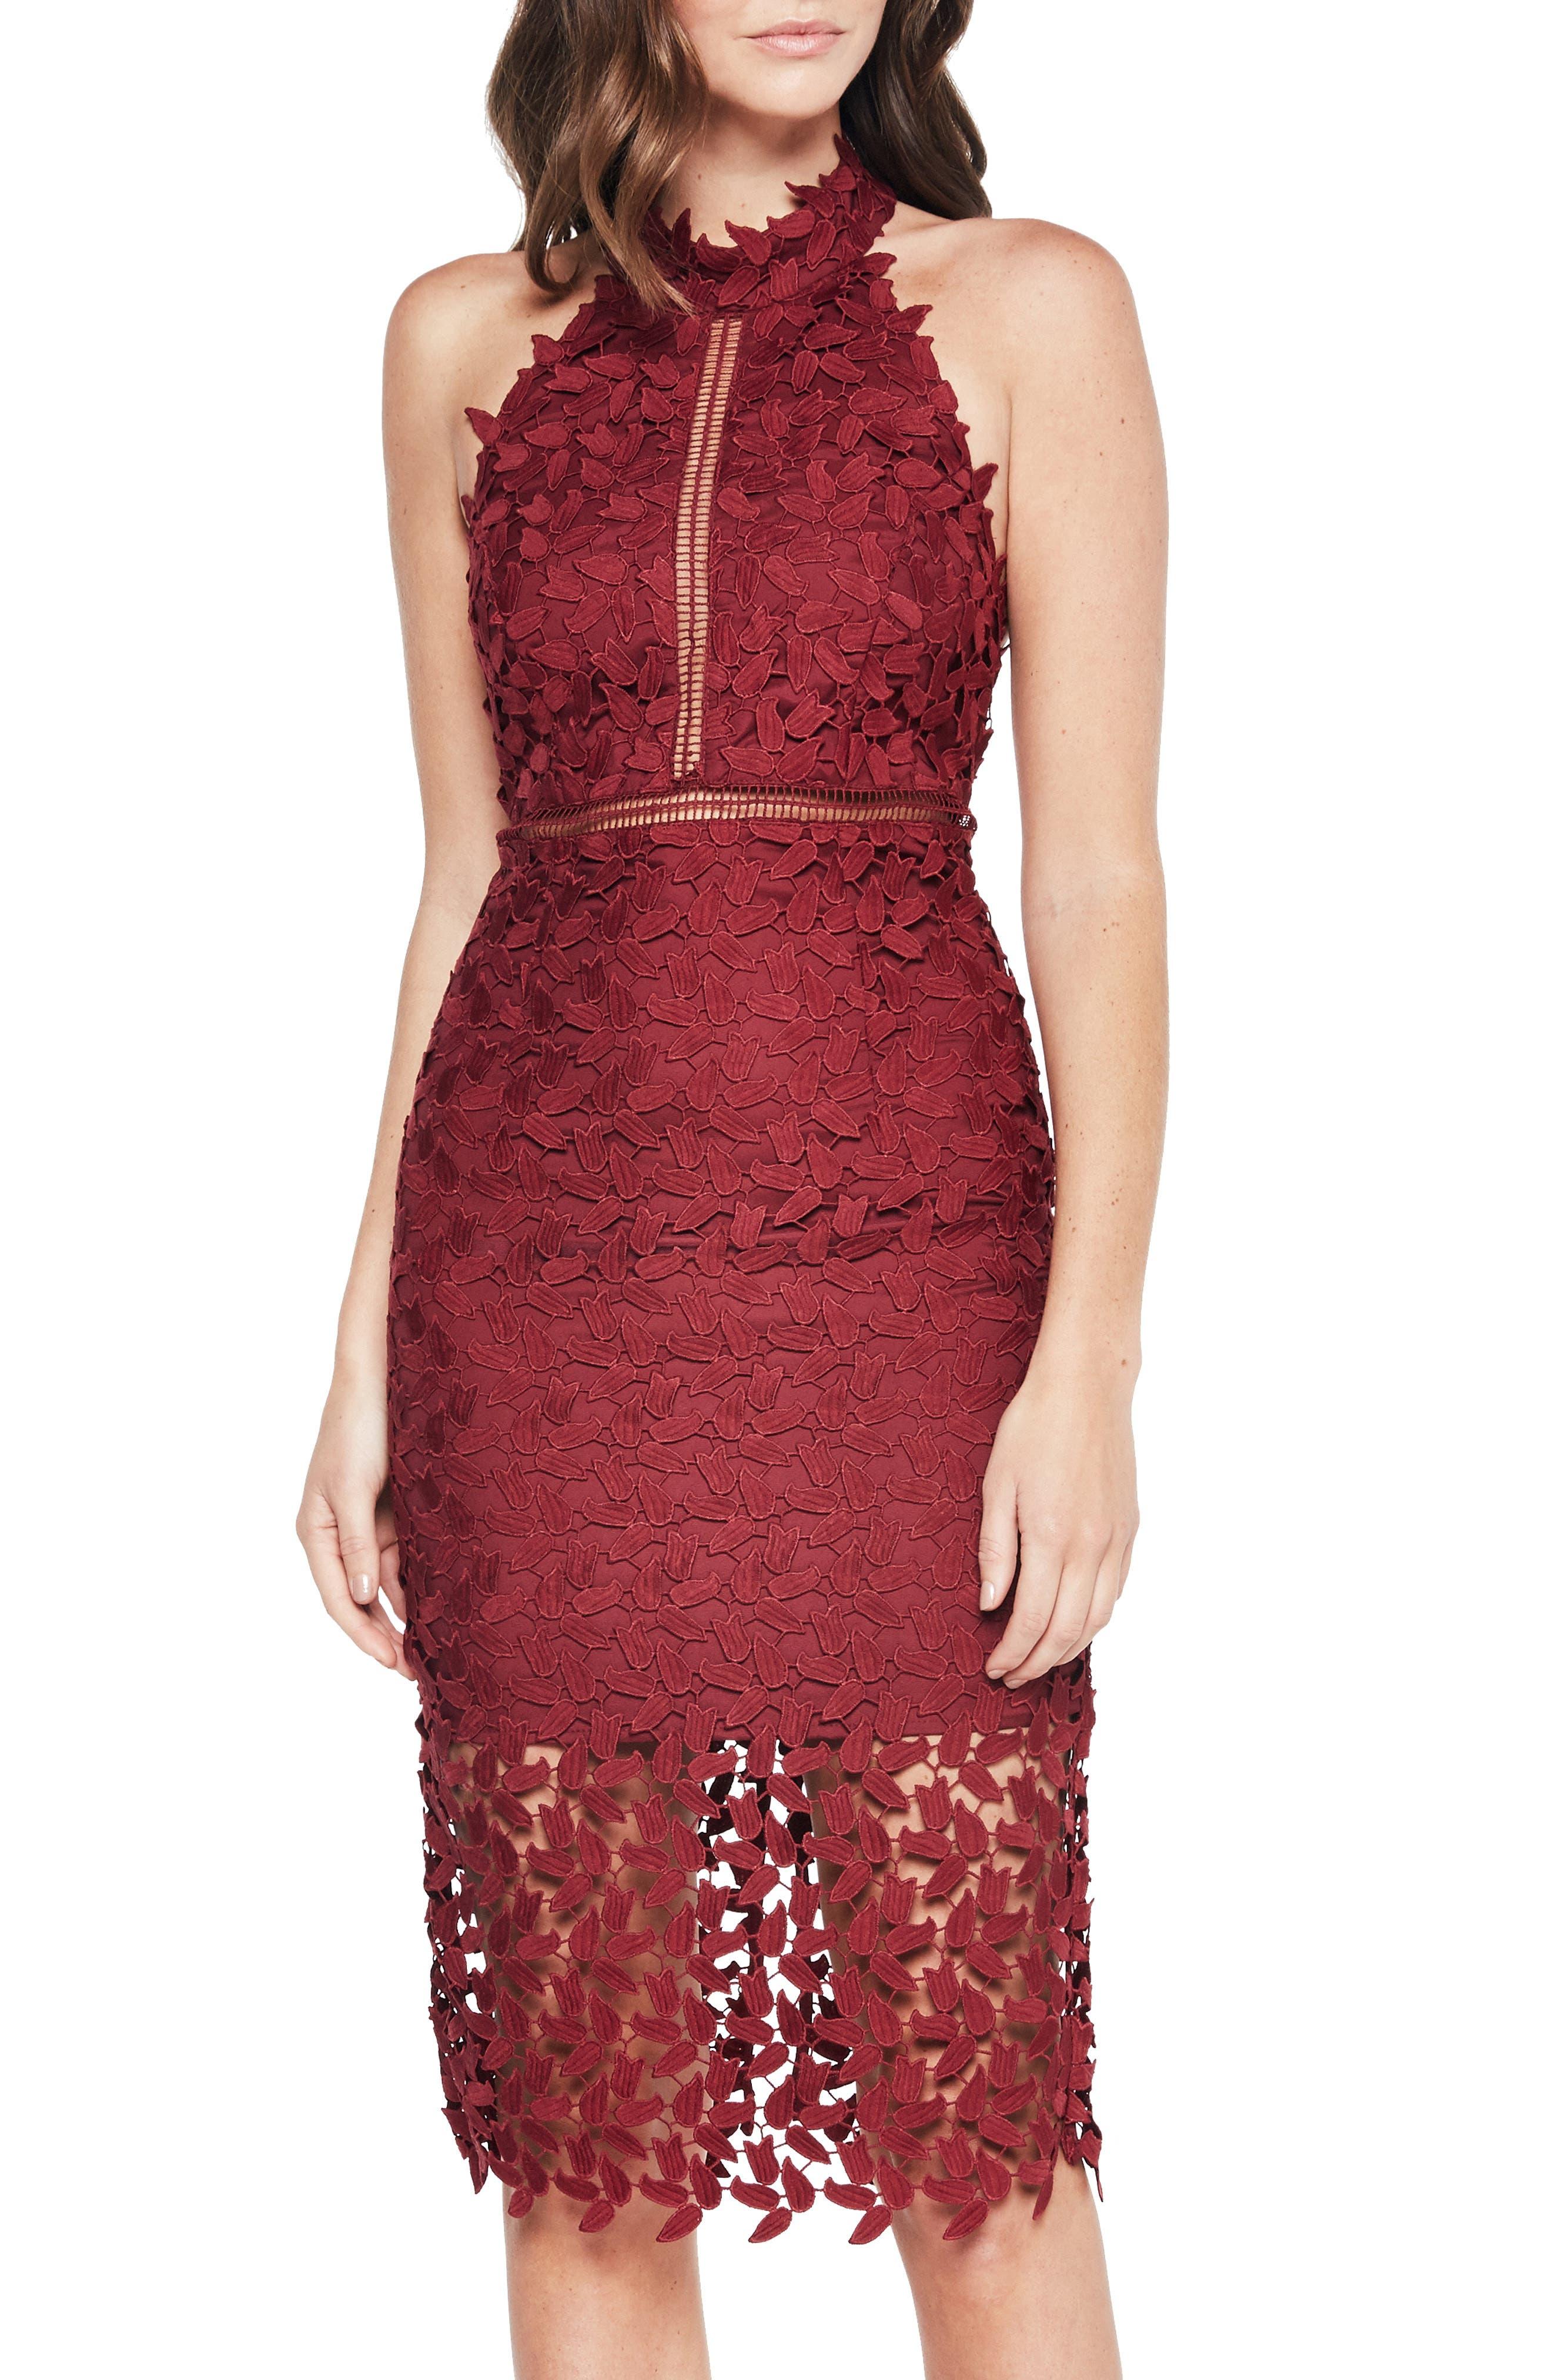 BARDOT, Gemma Halter Lace Sheath Dress, Alternate thumbnail 5, color, BURGUNDY